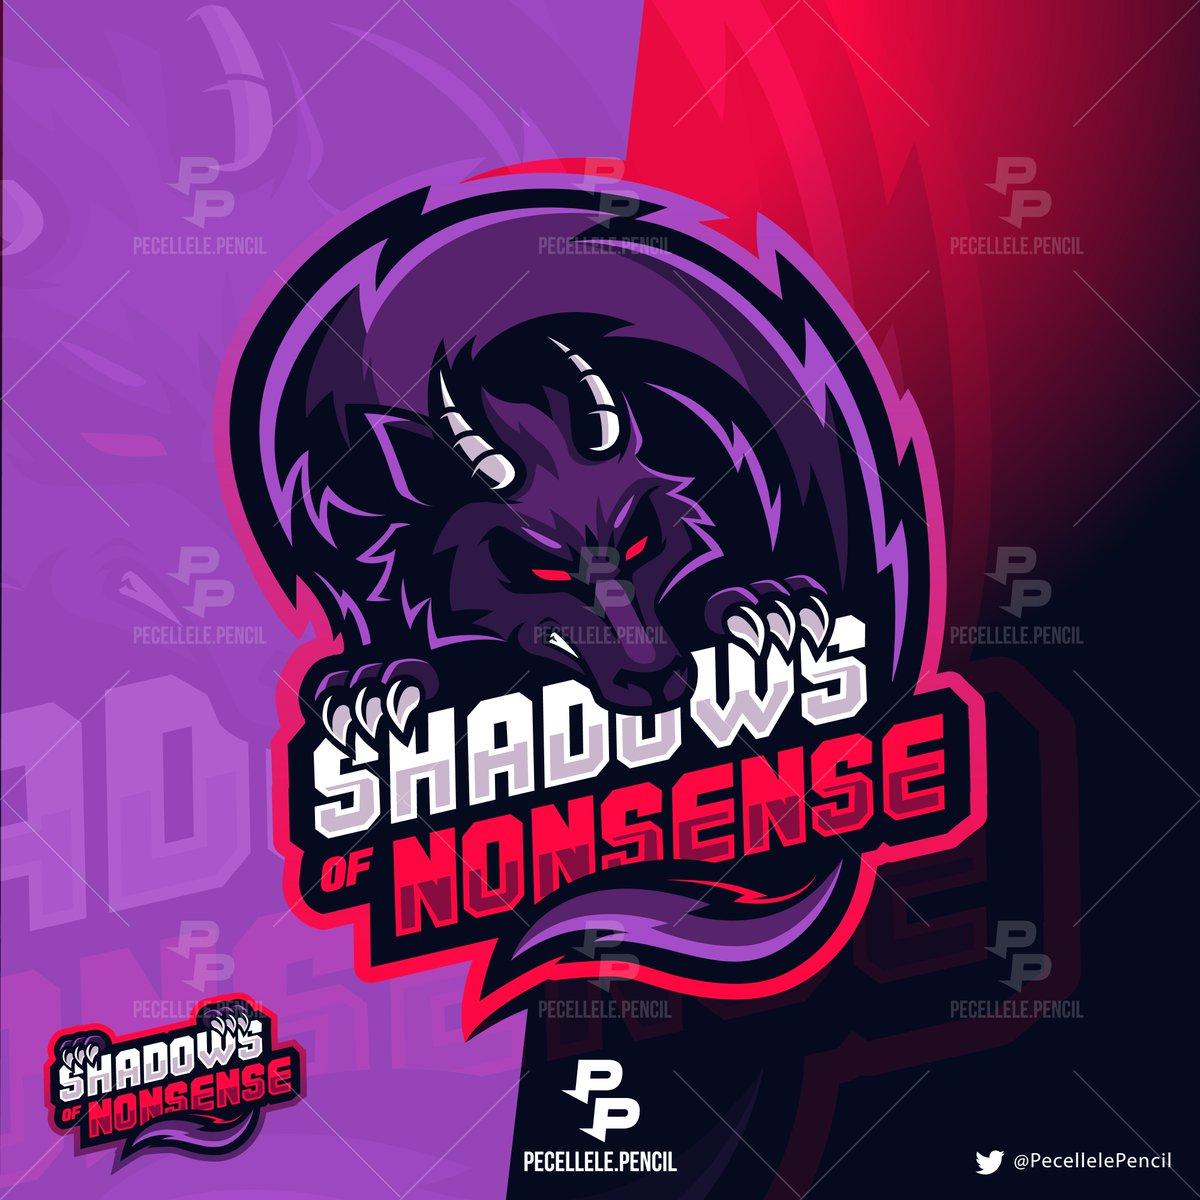 logo i did for a client. hire me if you need a logo design.  @DynoRTs @Demented_RTs @SGH_RTs   @GFXCoach @IconRTs @Agile_RTs @GamerGalsRT @PromoteGamers @BlazedRTs @DripRT @TwitchTVOnline  #twitchtv #esports #gaminglogo #mascotlogo #logogaming #squadlogo #Streamerpic.twitter.com/gHdlsyb3K2